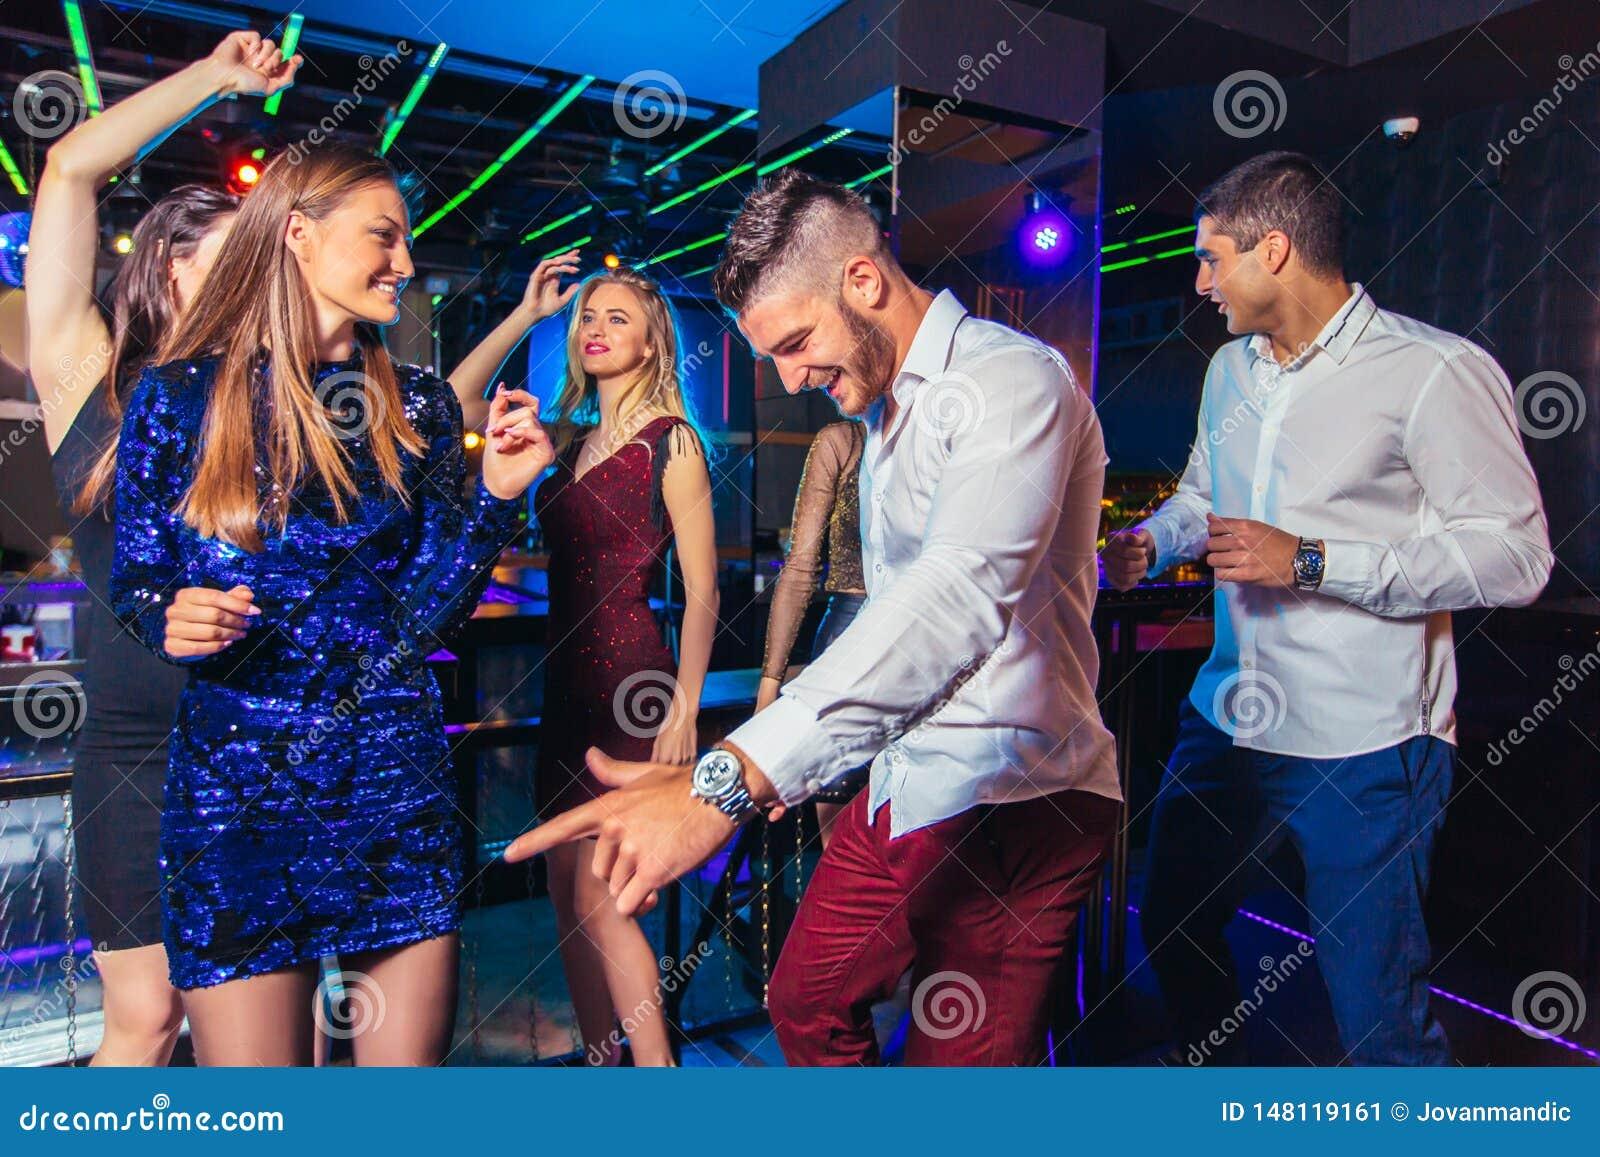 Friends partying in a nightclub